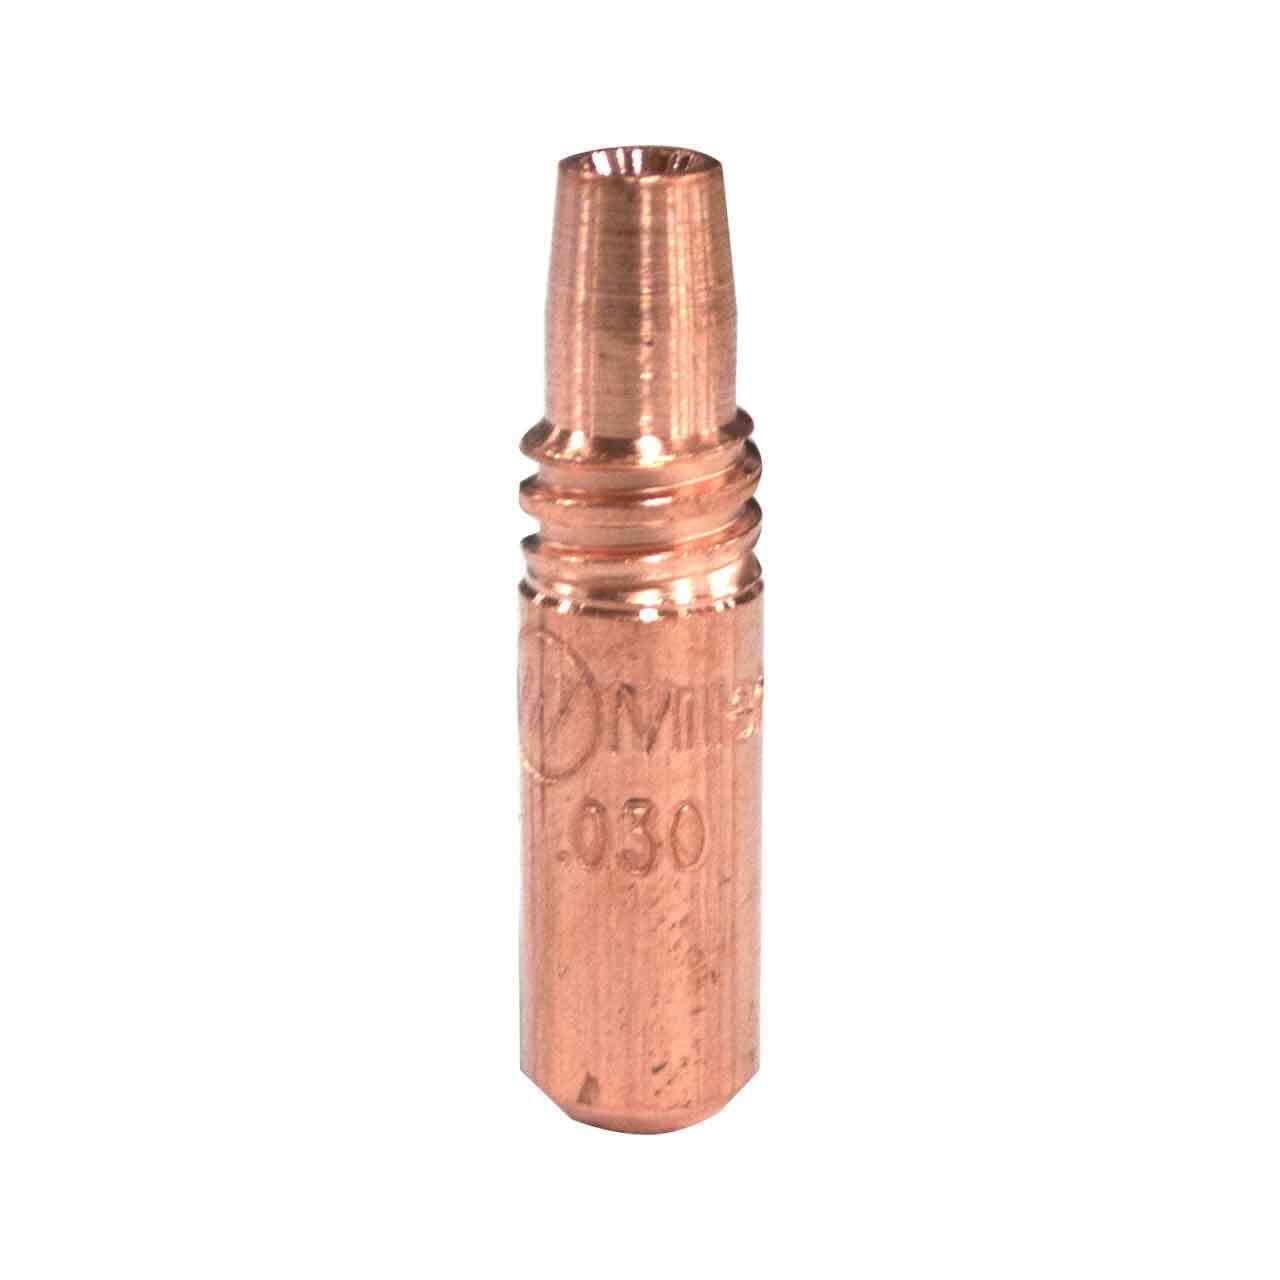 Miller Tip Pack of 25 #206185 FASTIP .312 OD .030 Wire